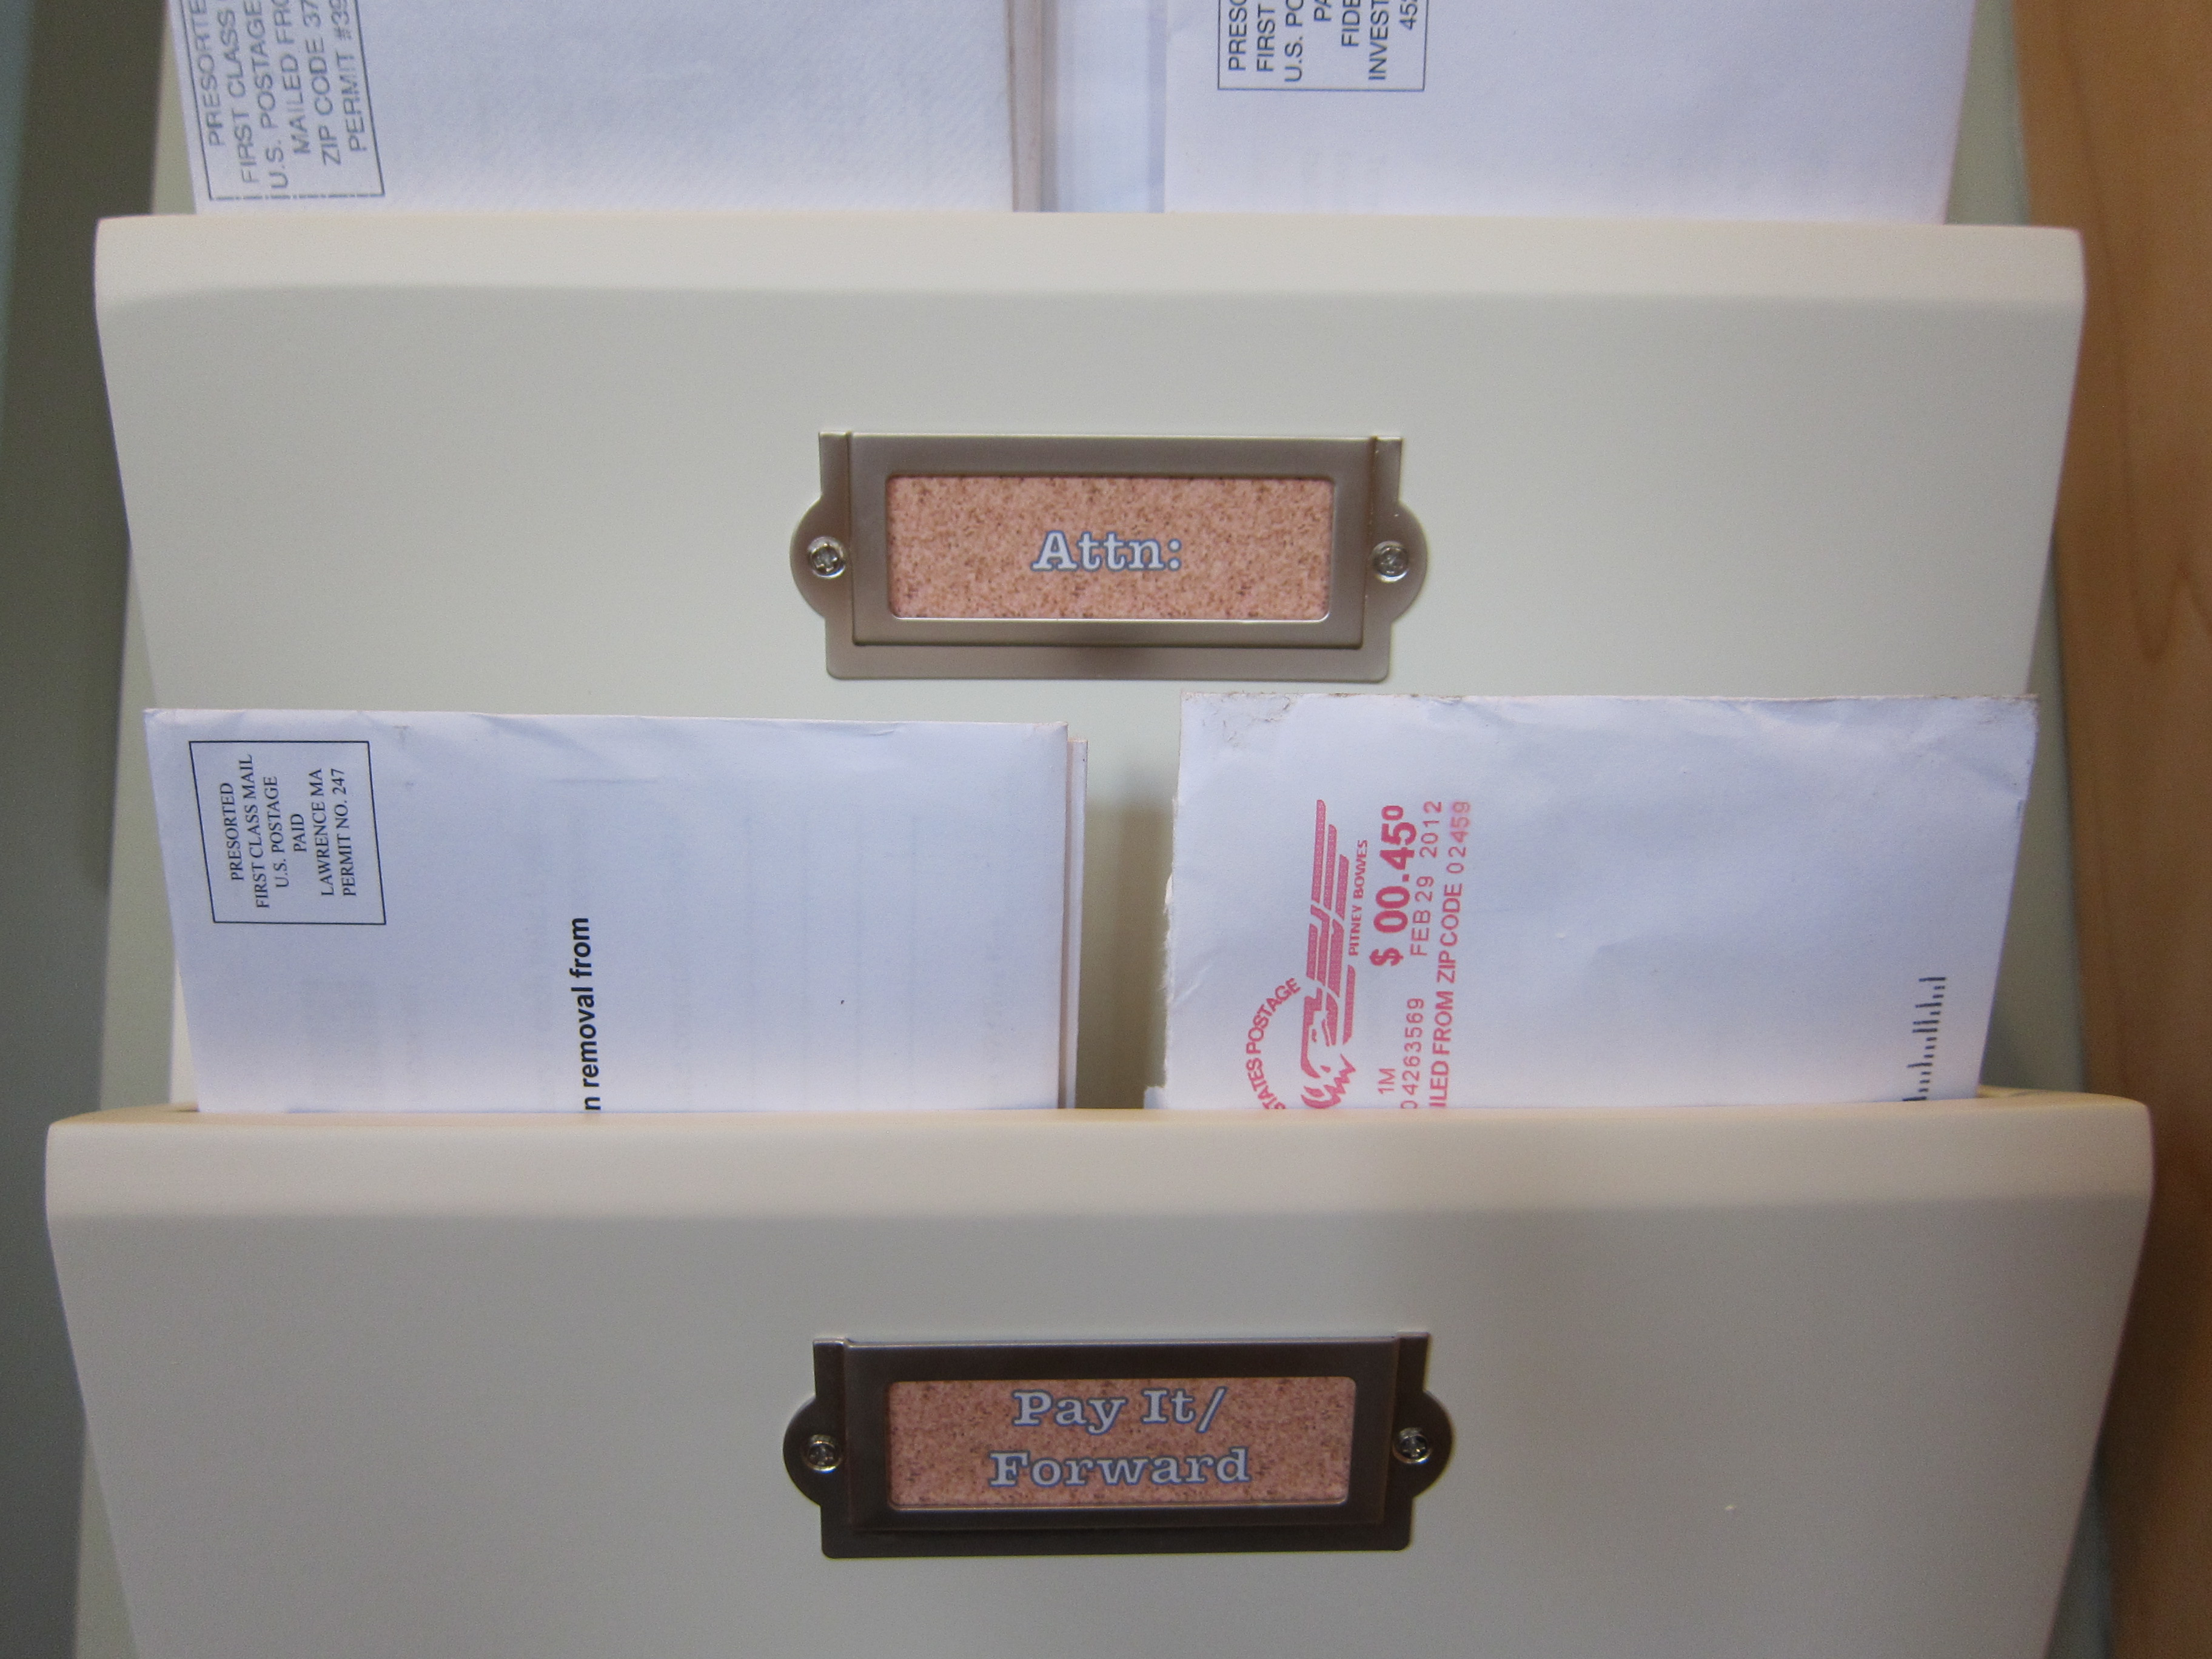 Mail Organization System